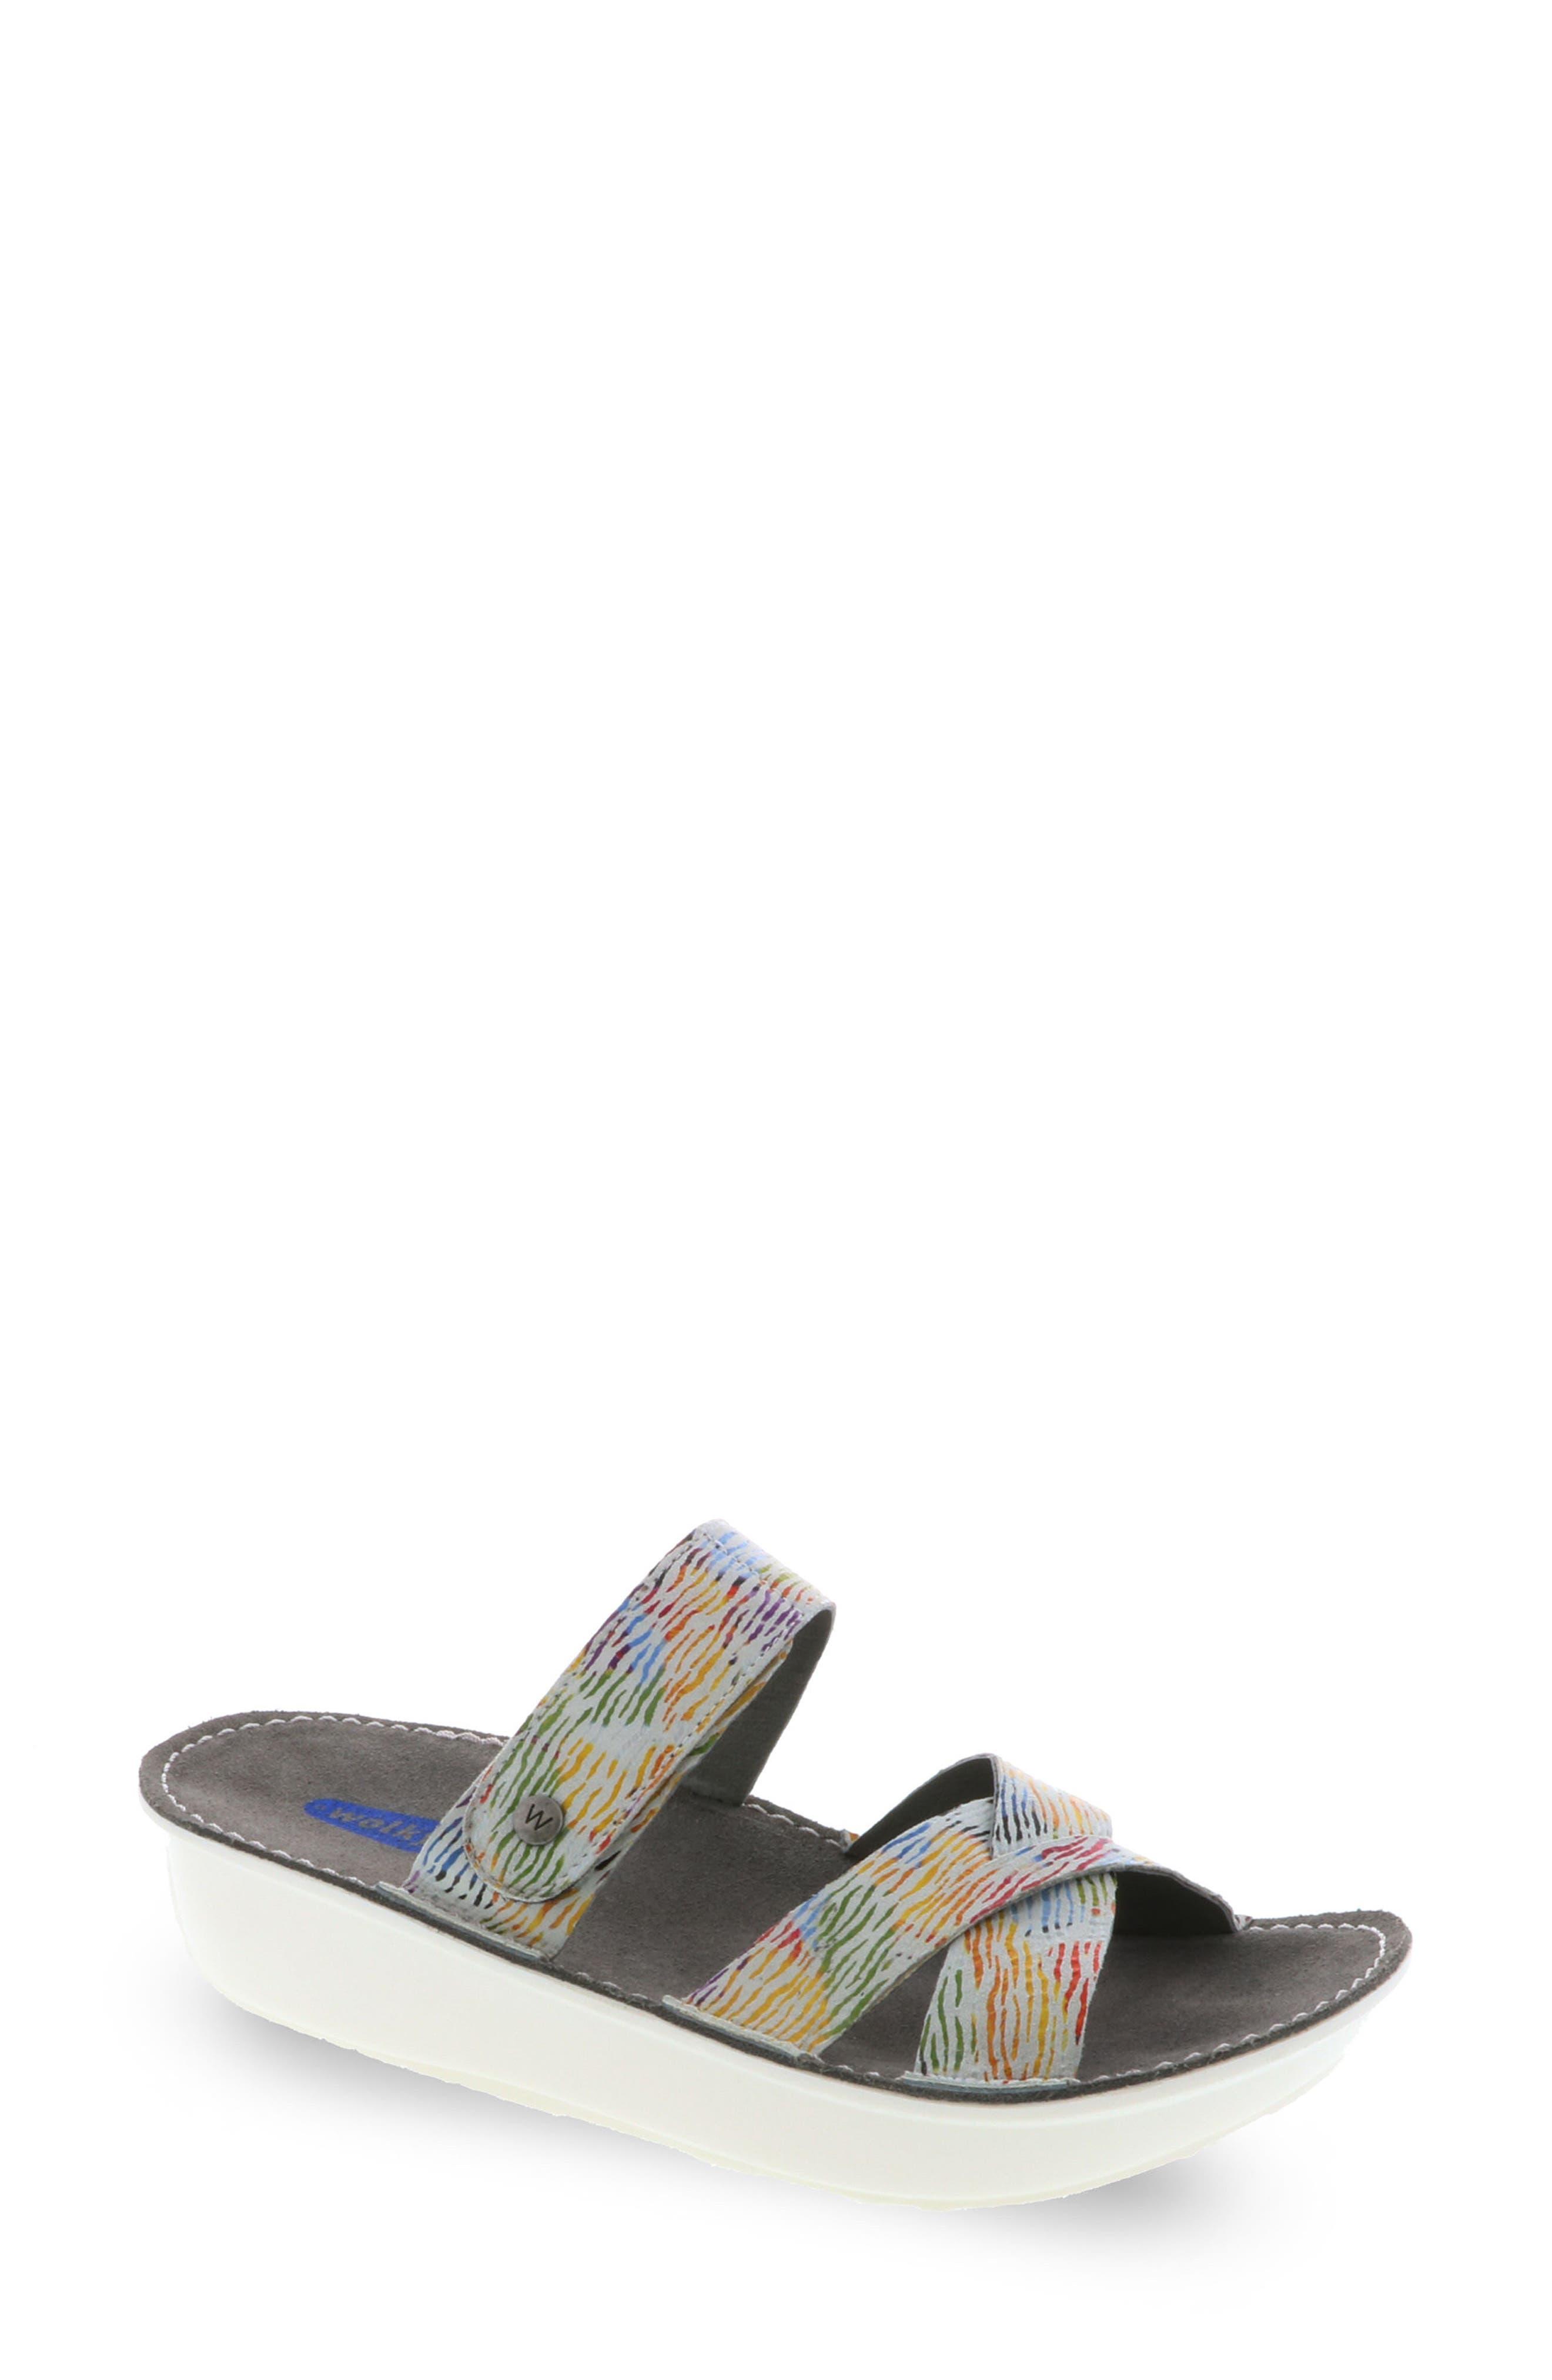 Bioko Sandal,                         Main,                         color, White Multi